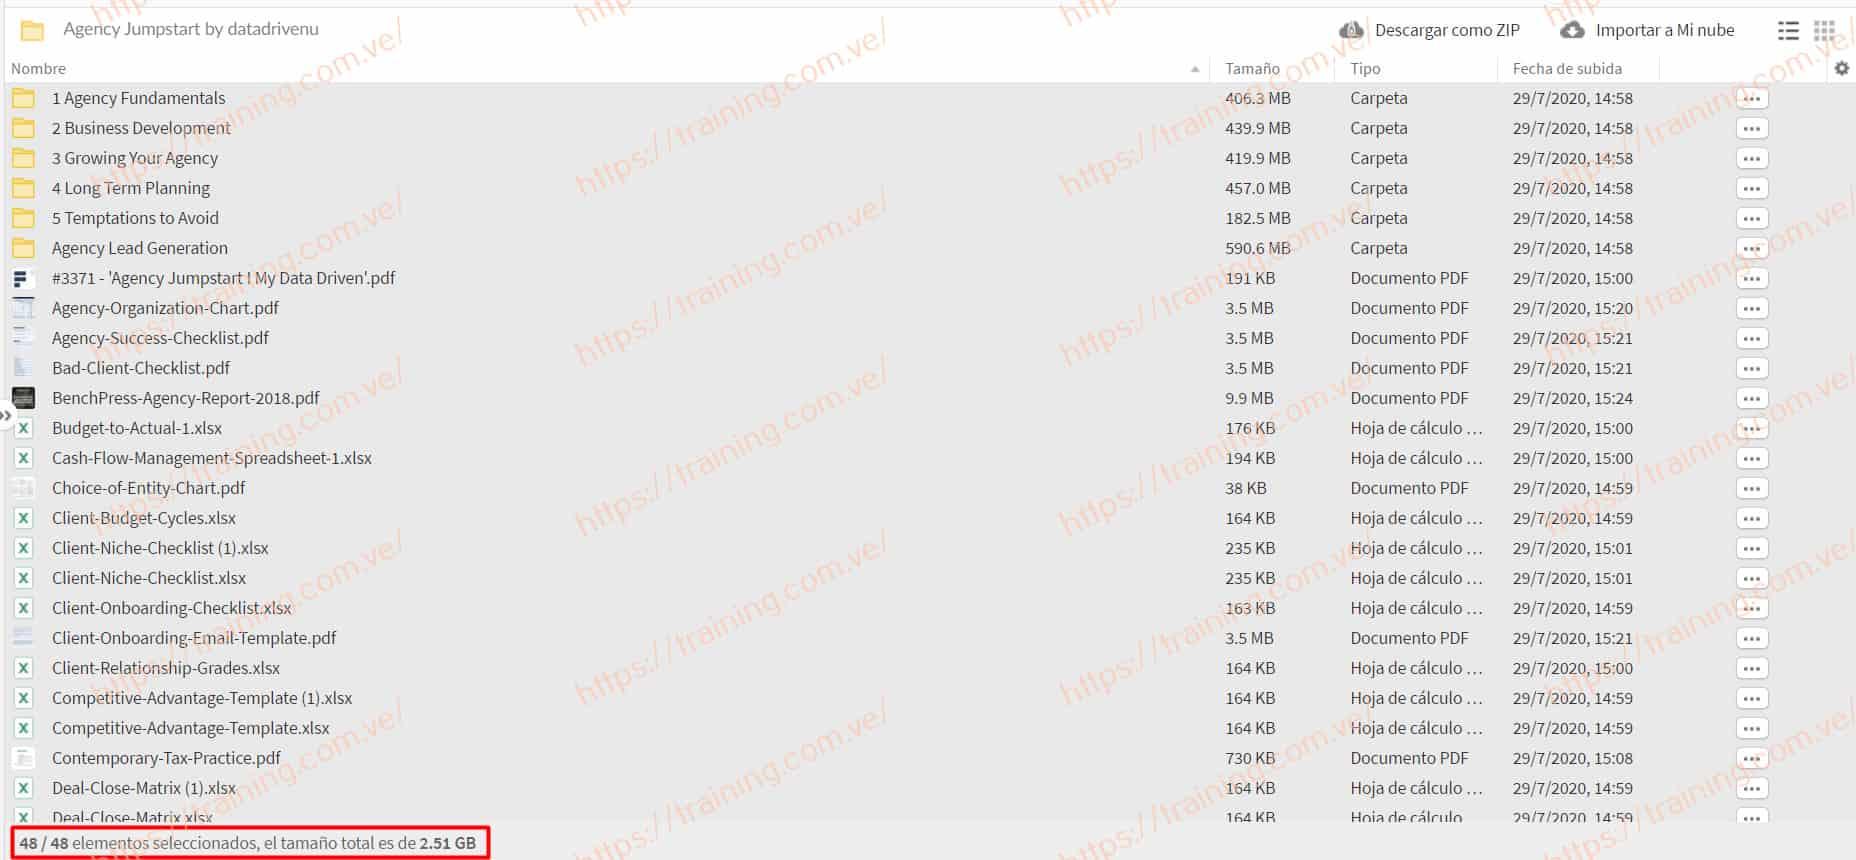 Agency Jumpstart by datadrivenu (Incldes Sales Jumpstart) Torrent